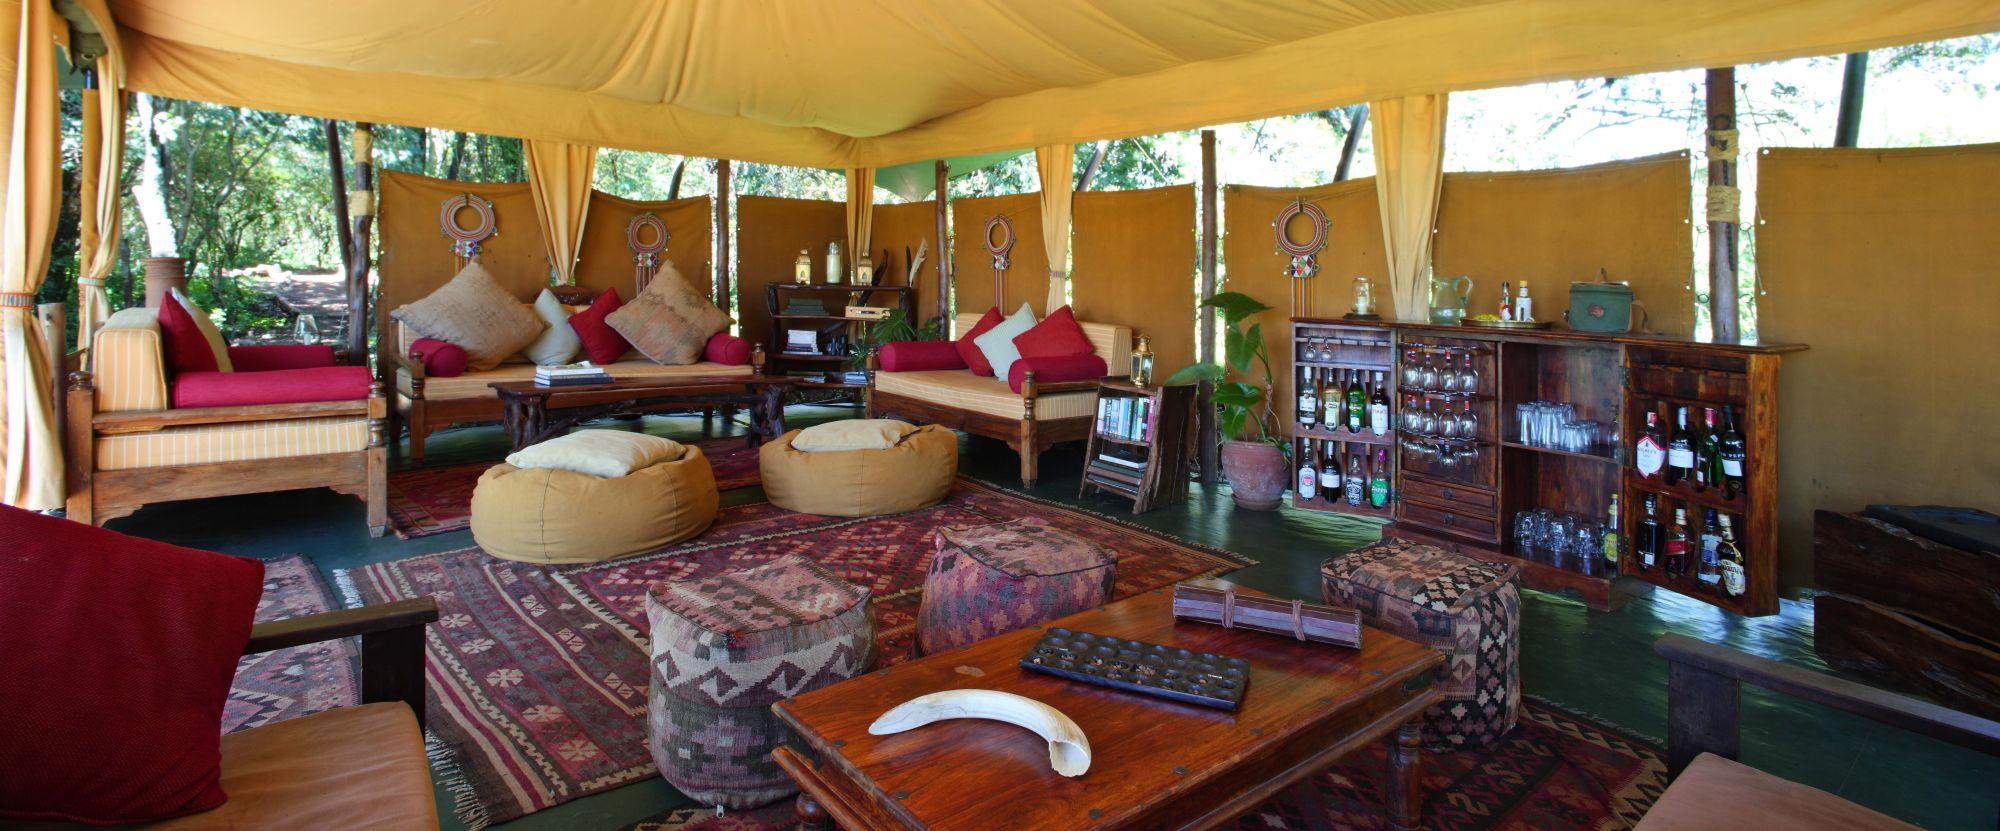 EPC - Mess Tent Interiors